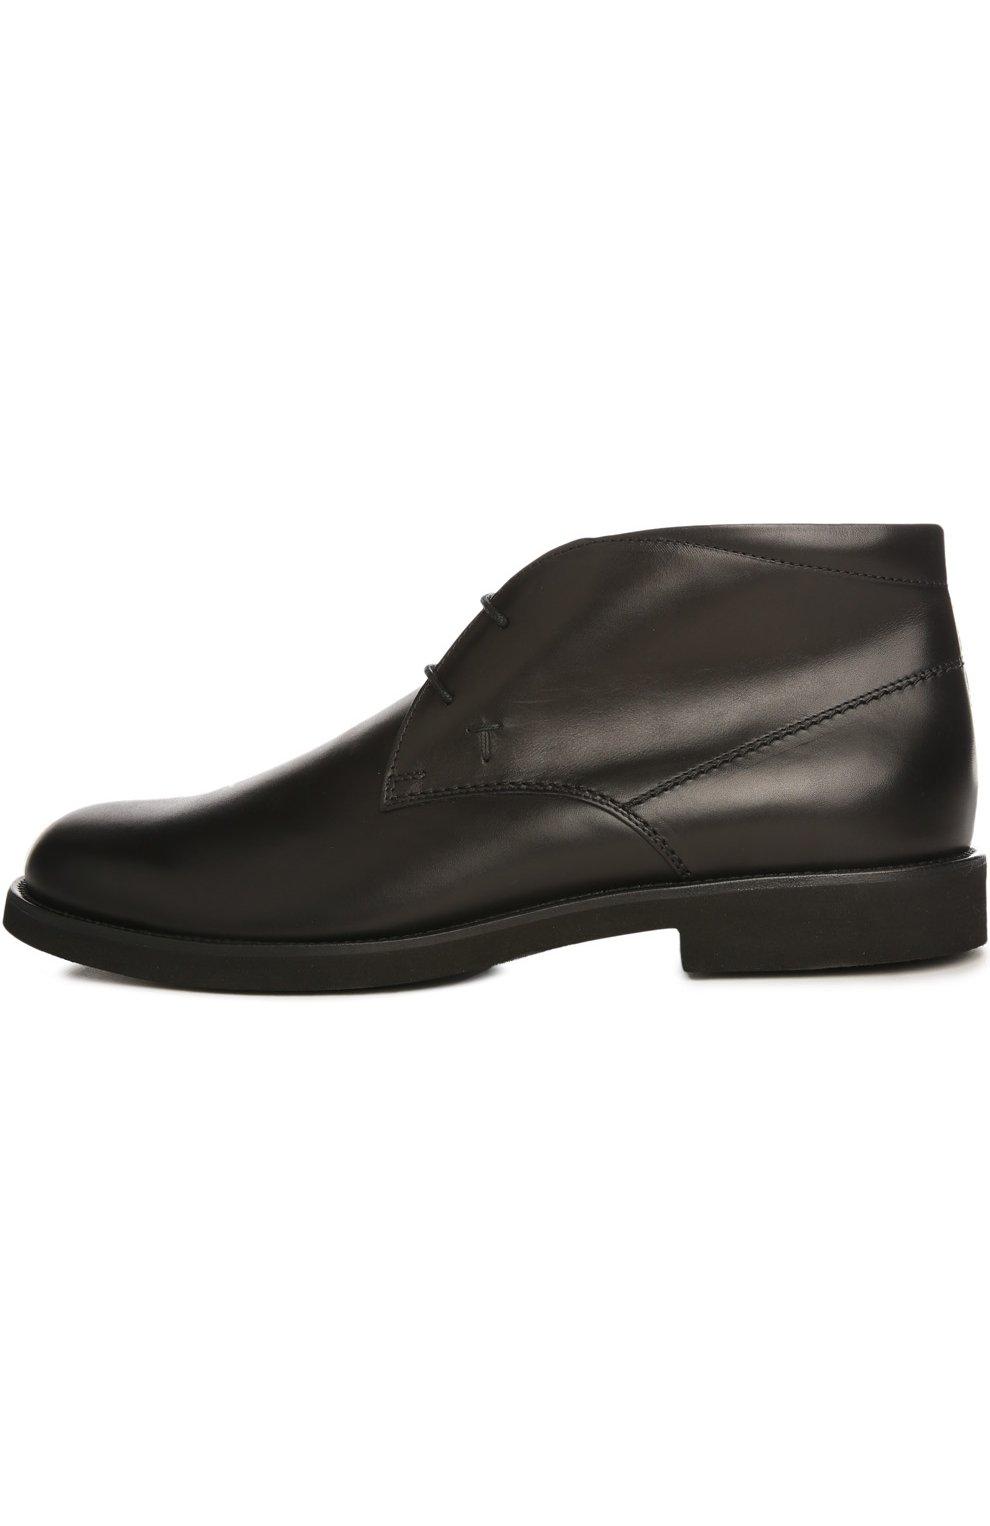 Кожаные ботинки Gomma   Фото №1